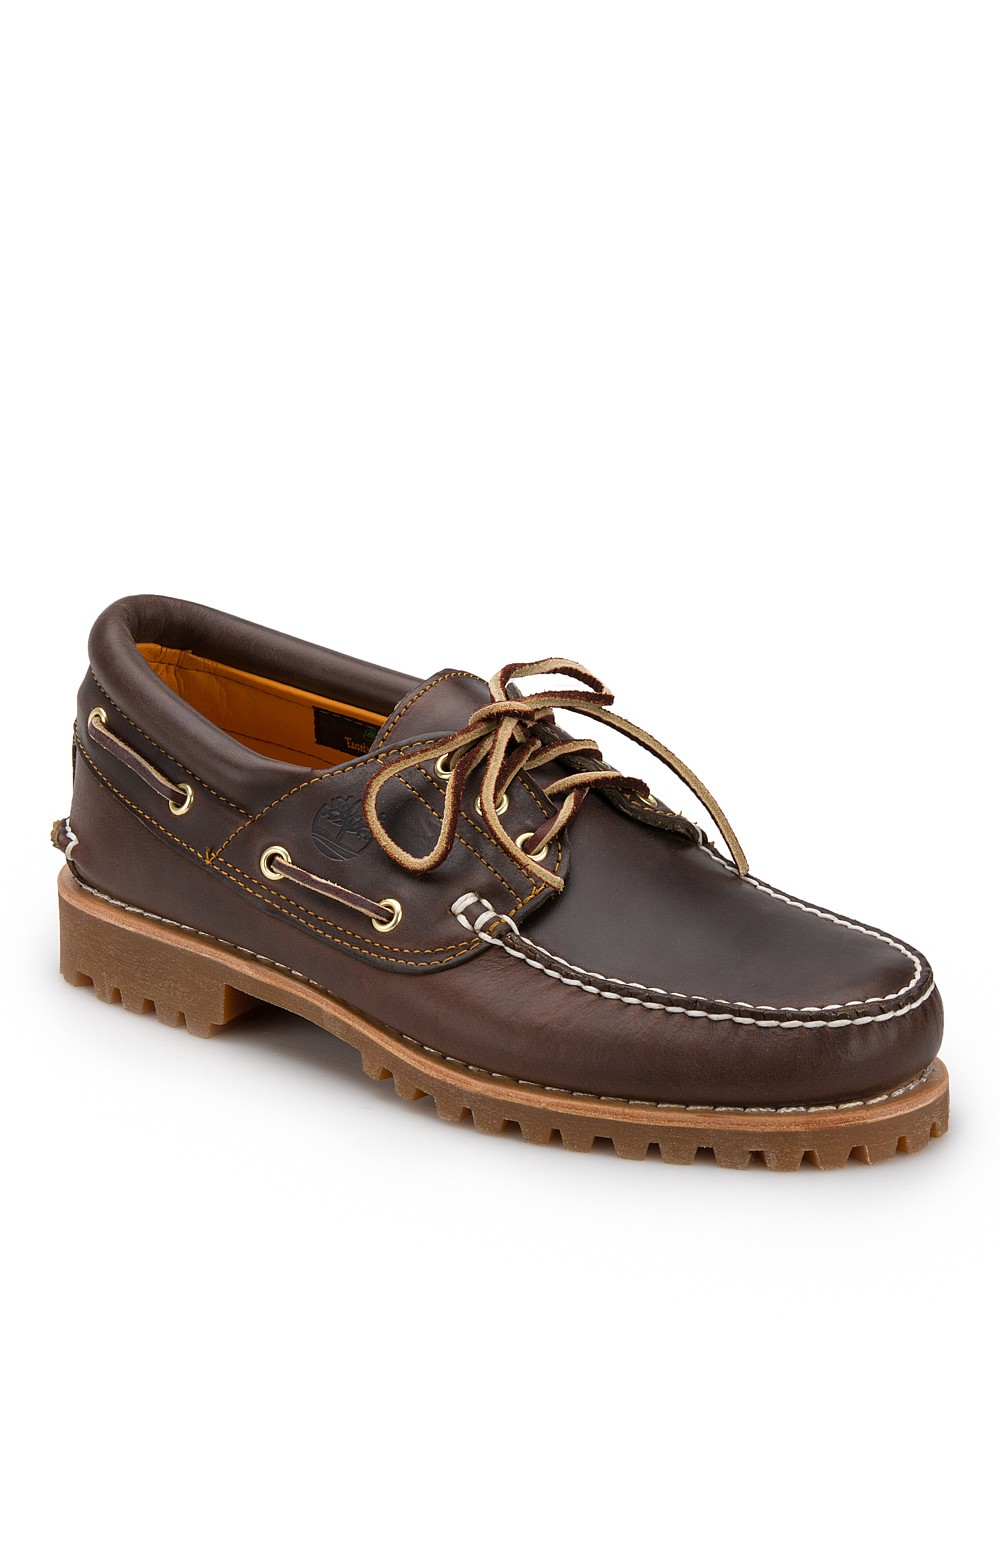 b0c2661fa16 Mens Timberland 3 Eye Boat Shoe